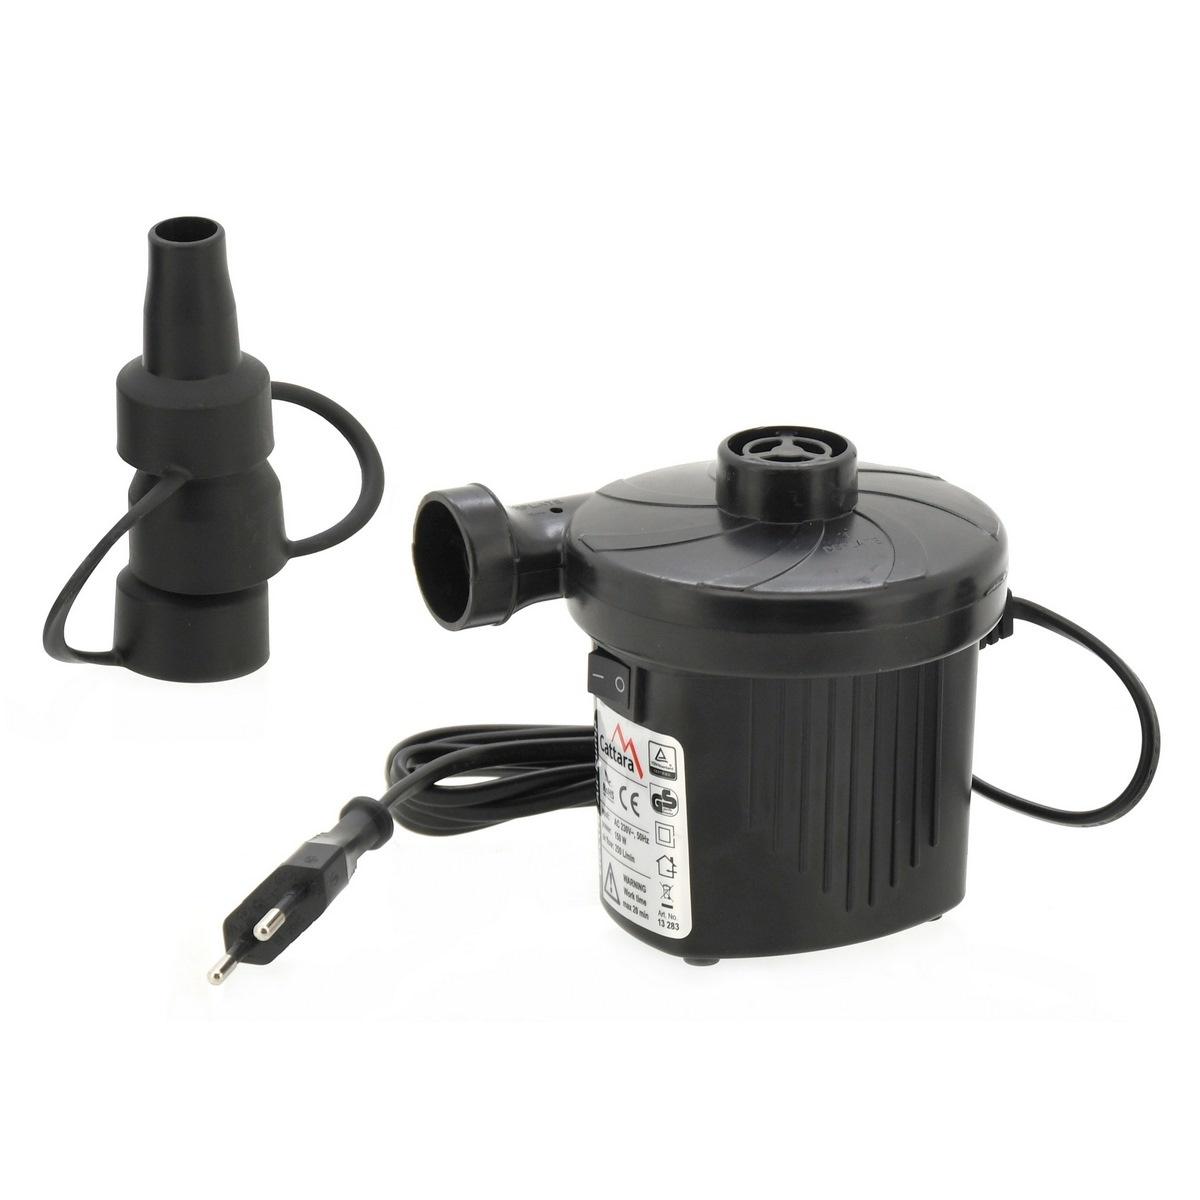 Cattara Vzduchová pumpa, 230 V 13283